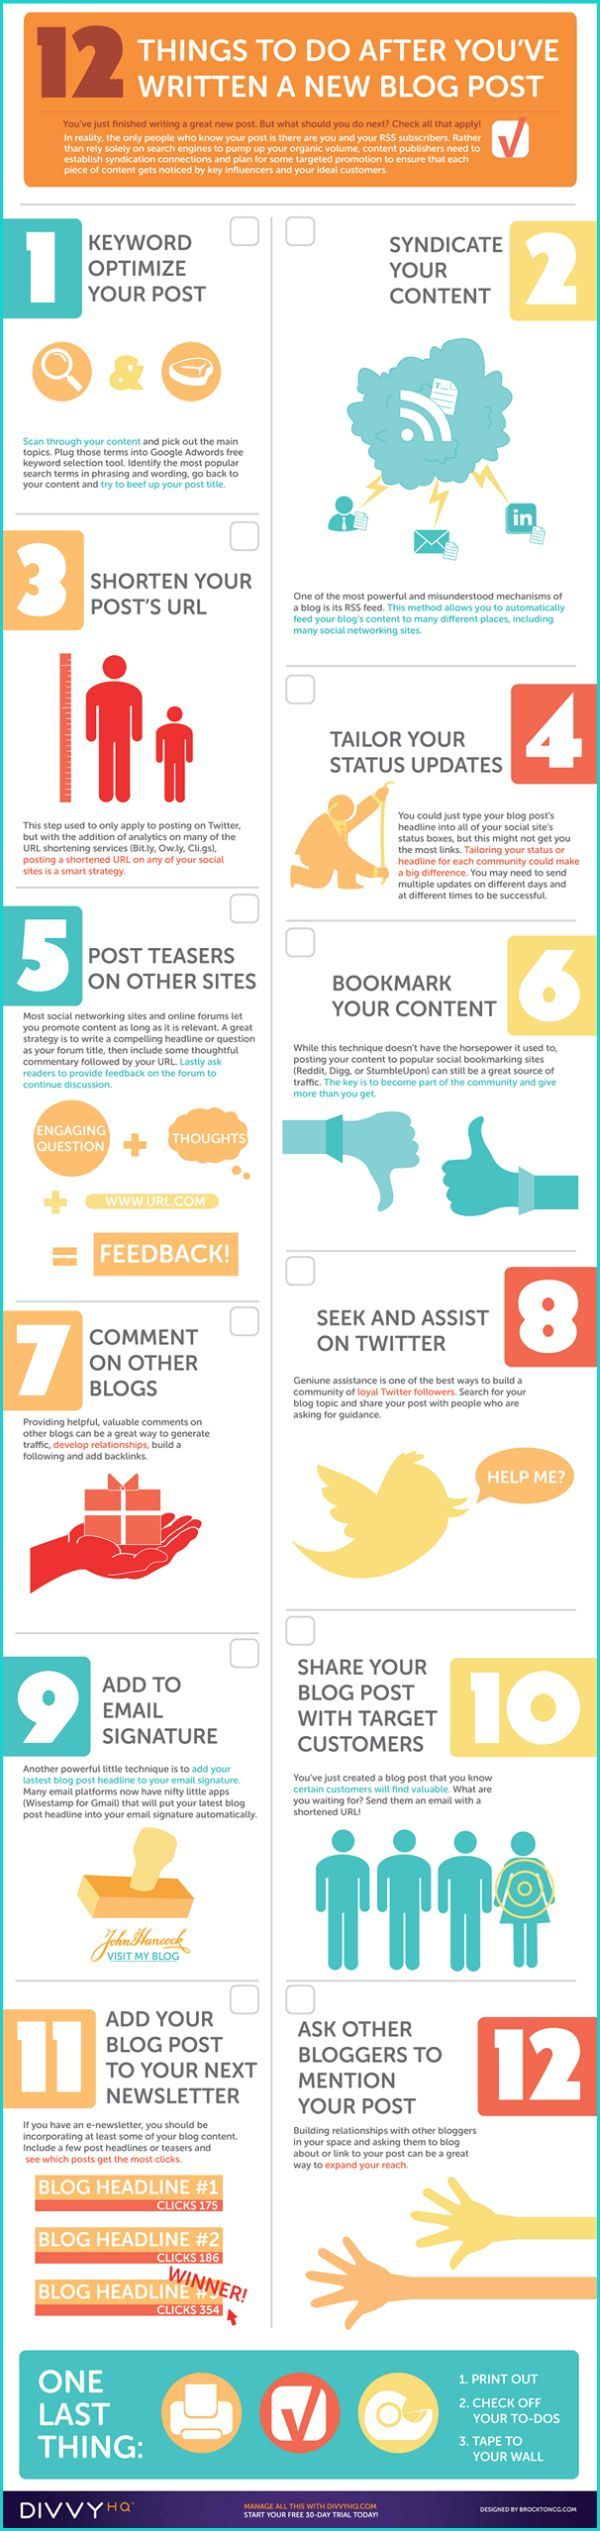 Tags: #blogposts #blogs #engagement #content